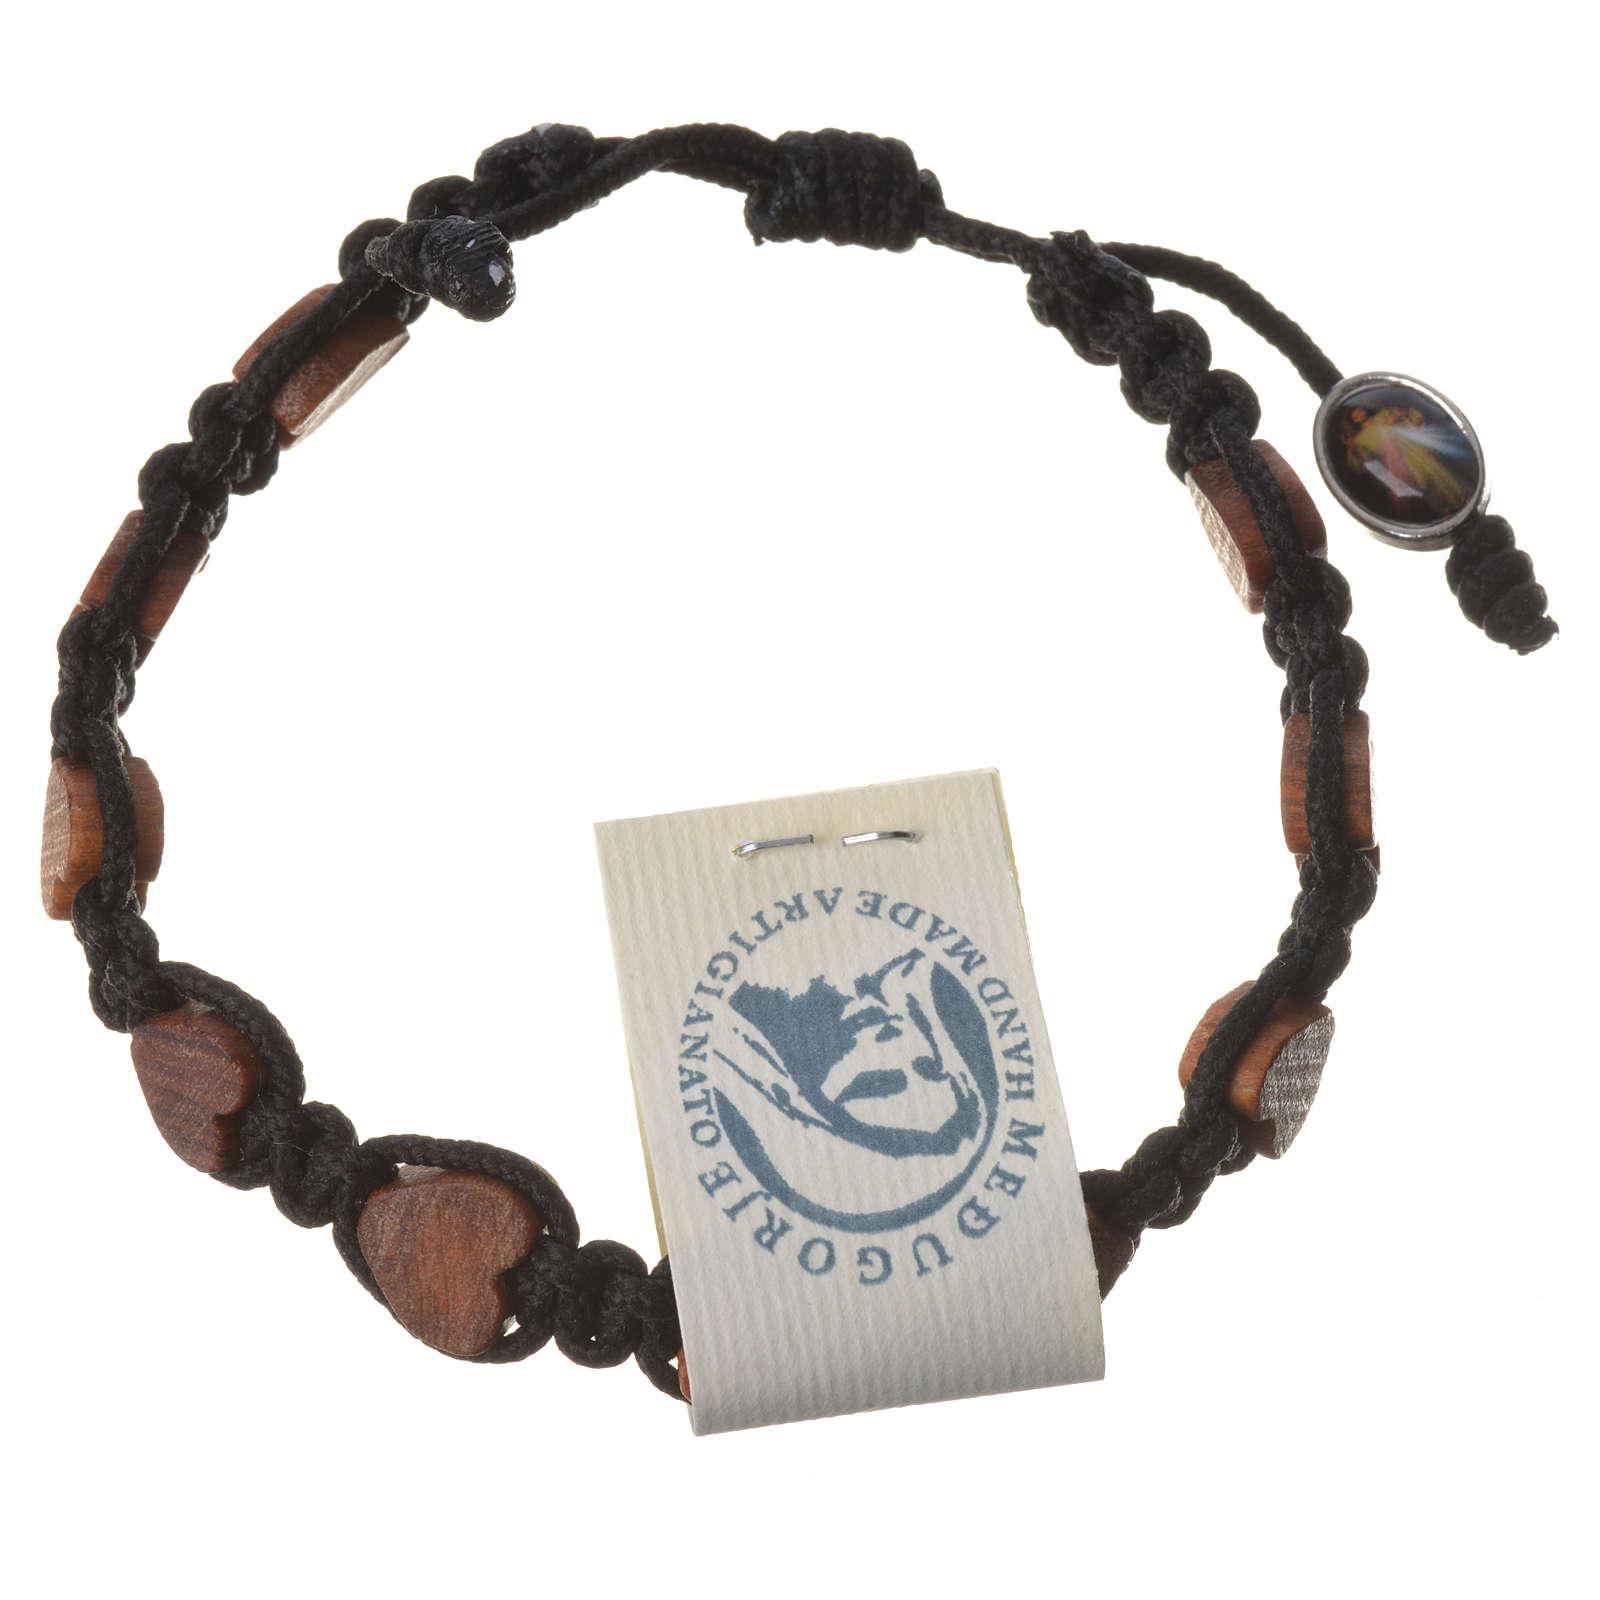 Bracciale Medjugorje corda nera grani ulivo cuore 4